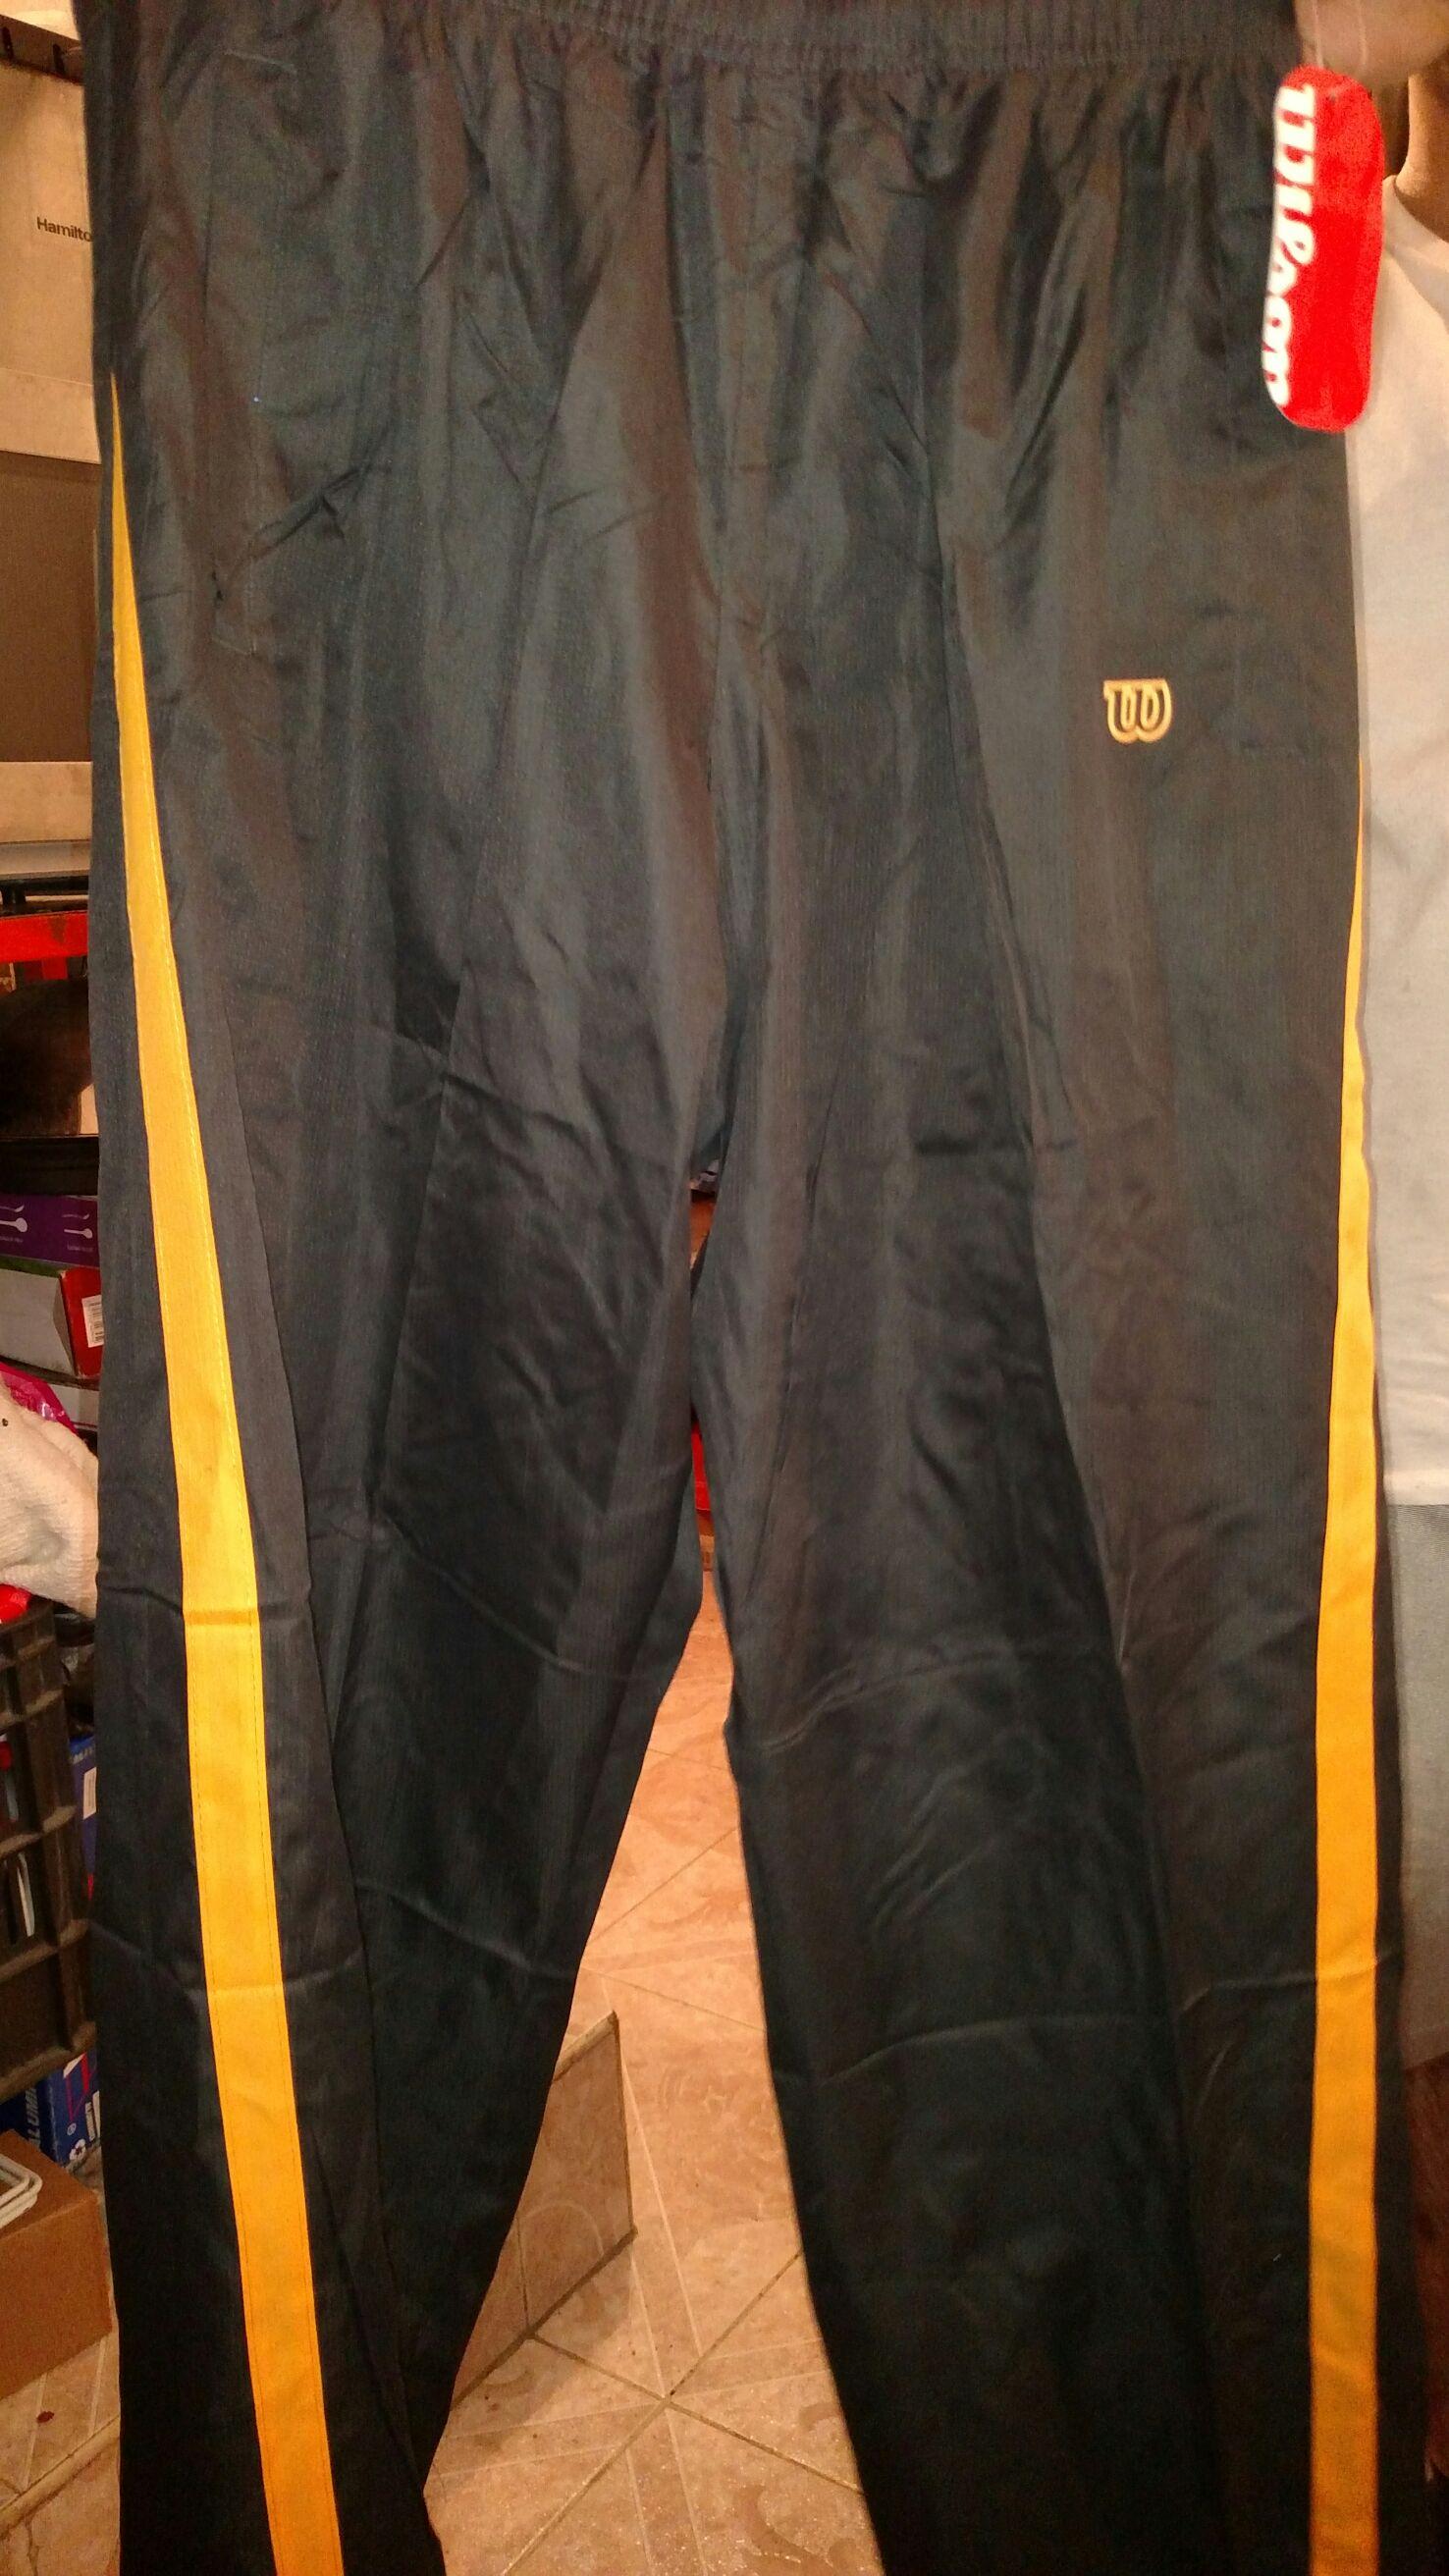 Bodega Aurrerá: Pantalón deportivo Wilson a $60.02